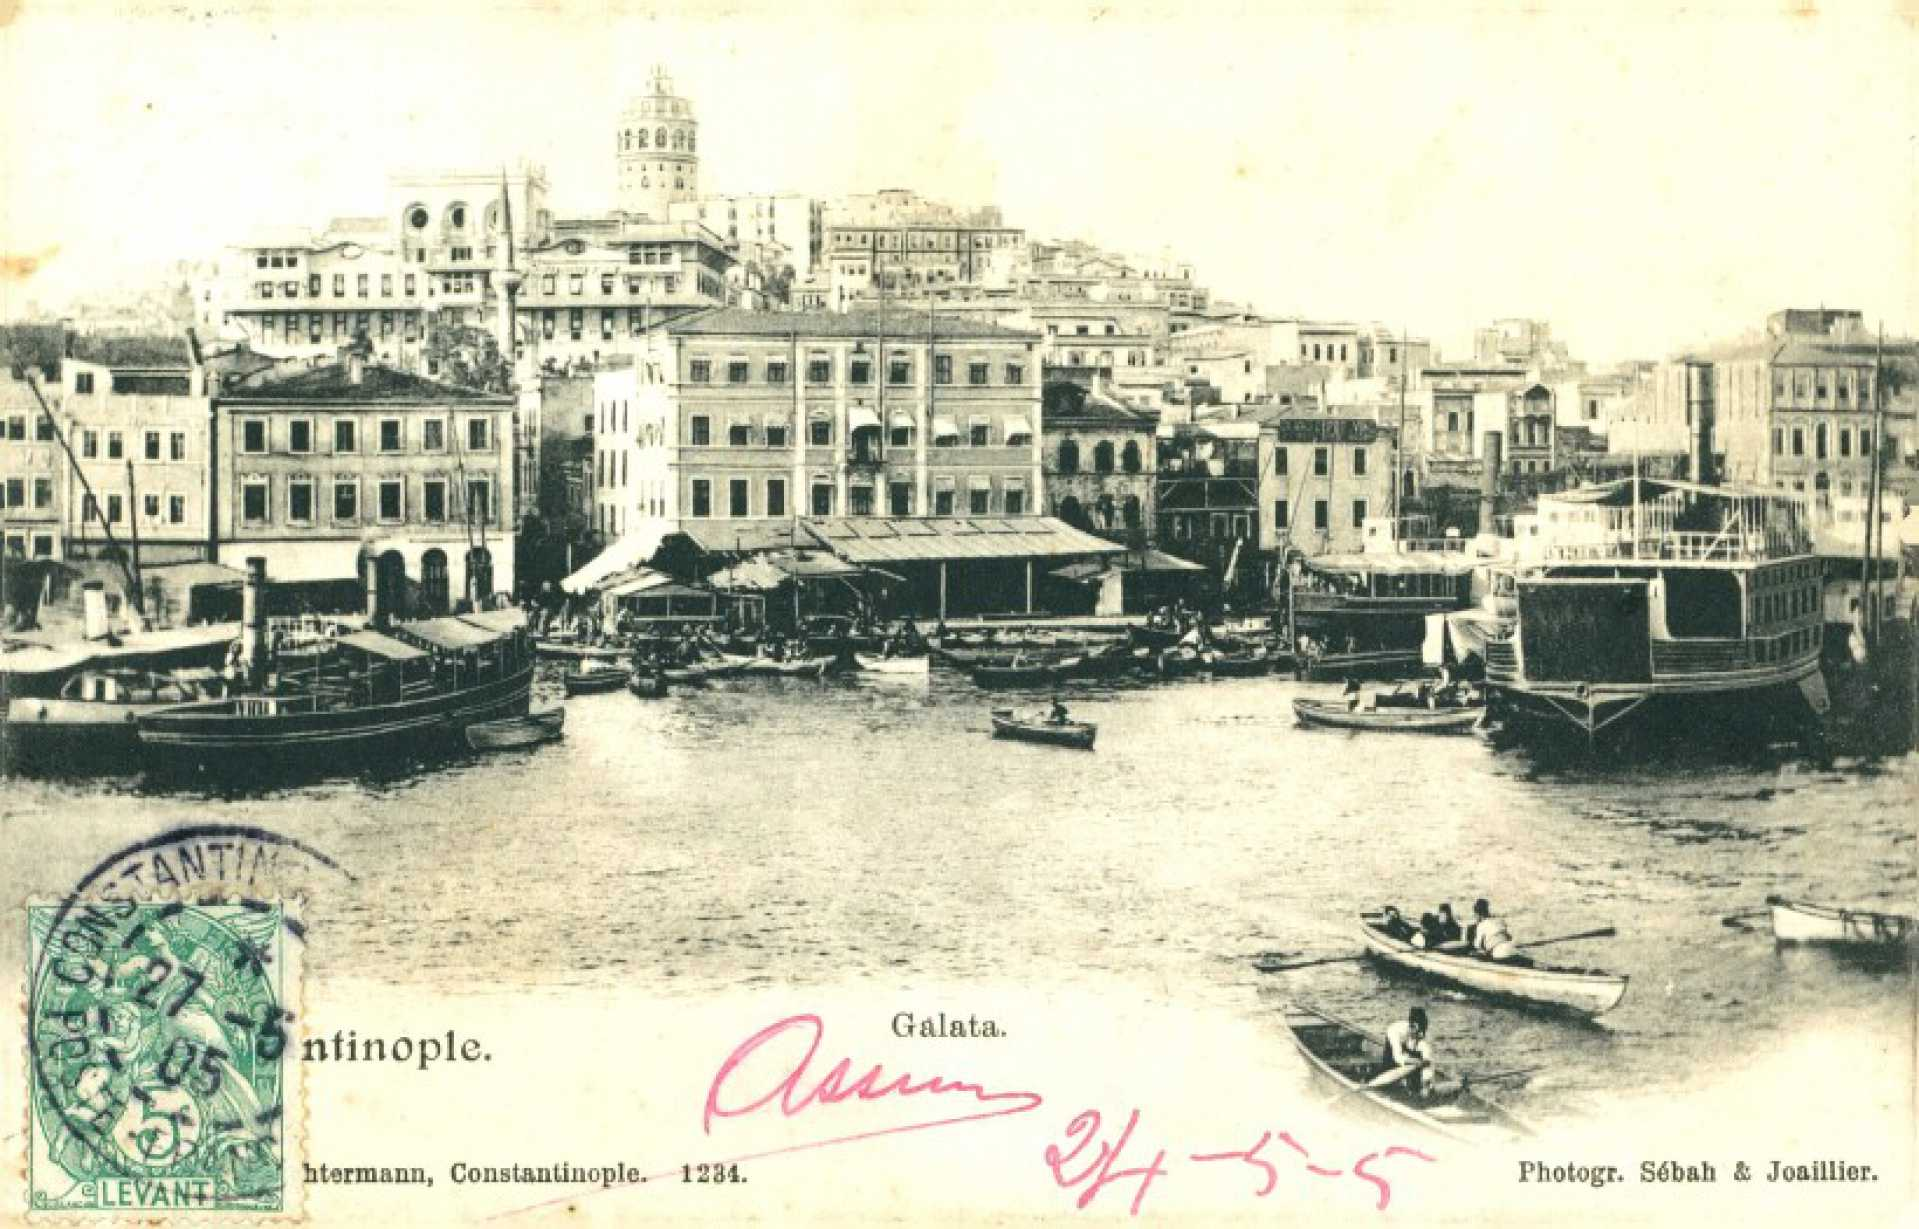 Constantinople. Galata